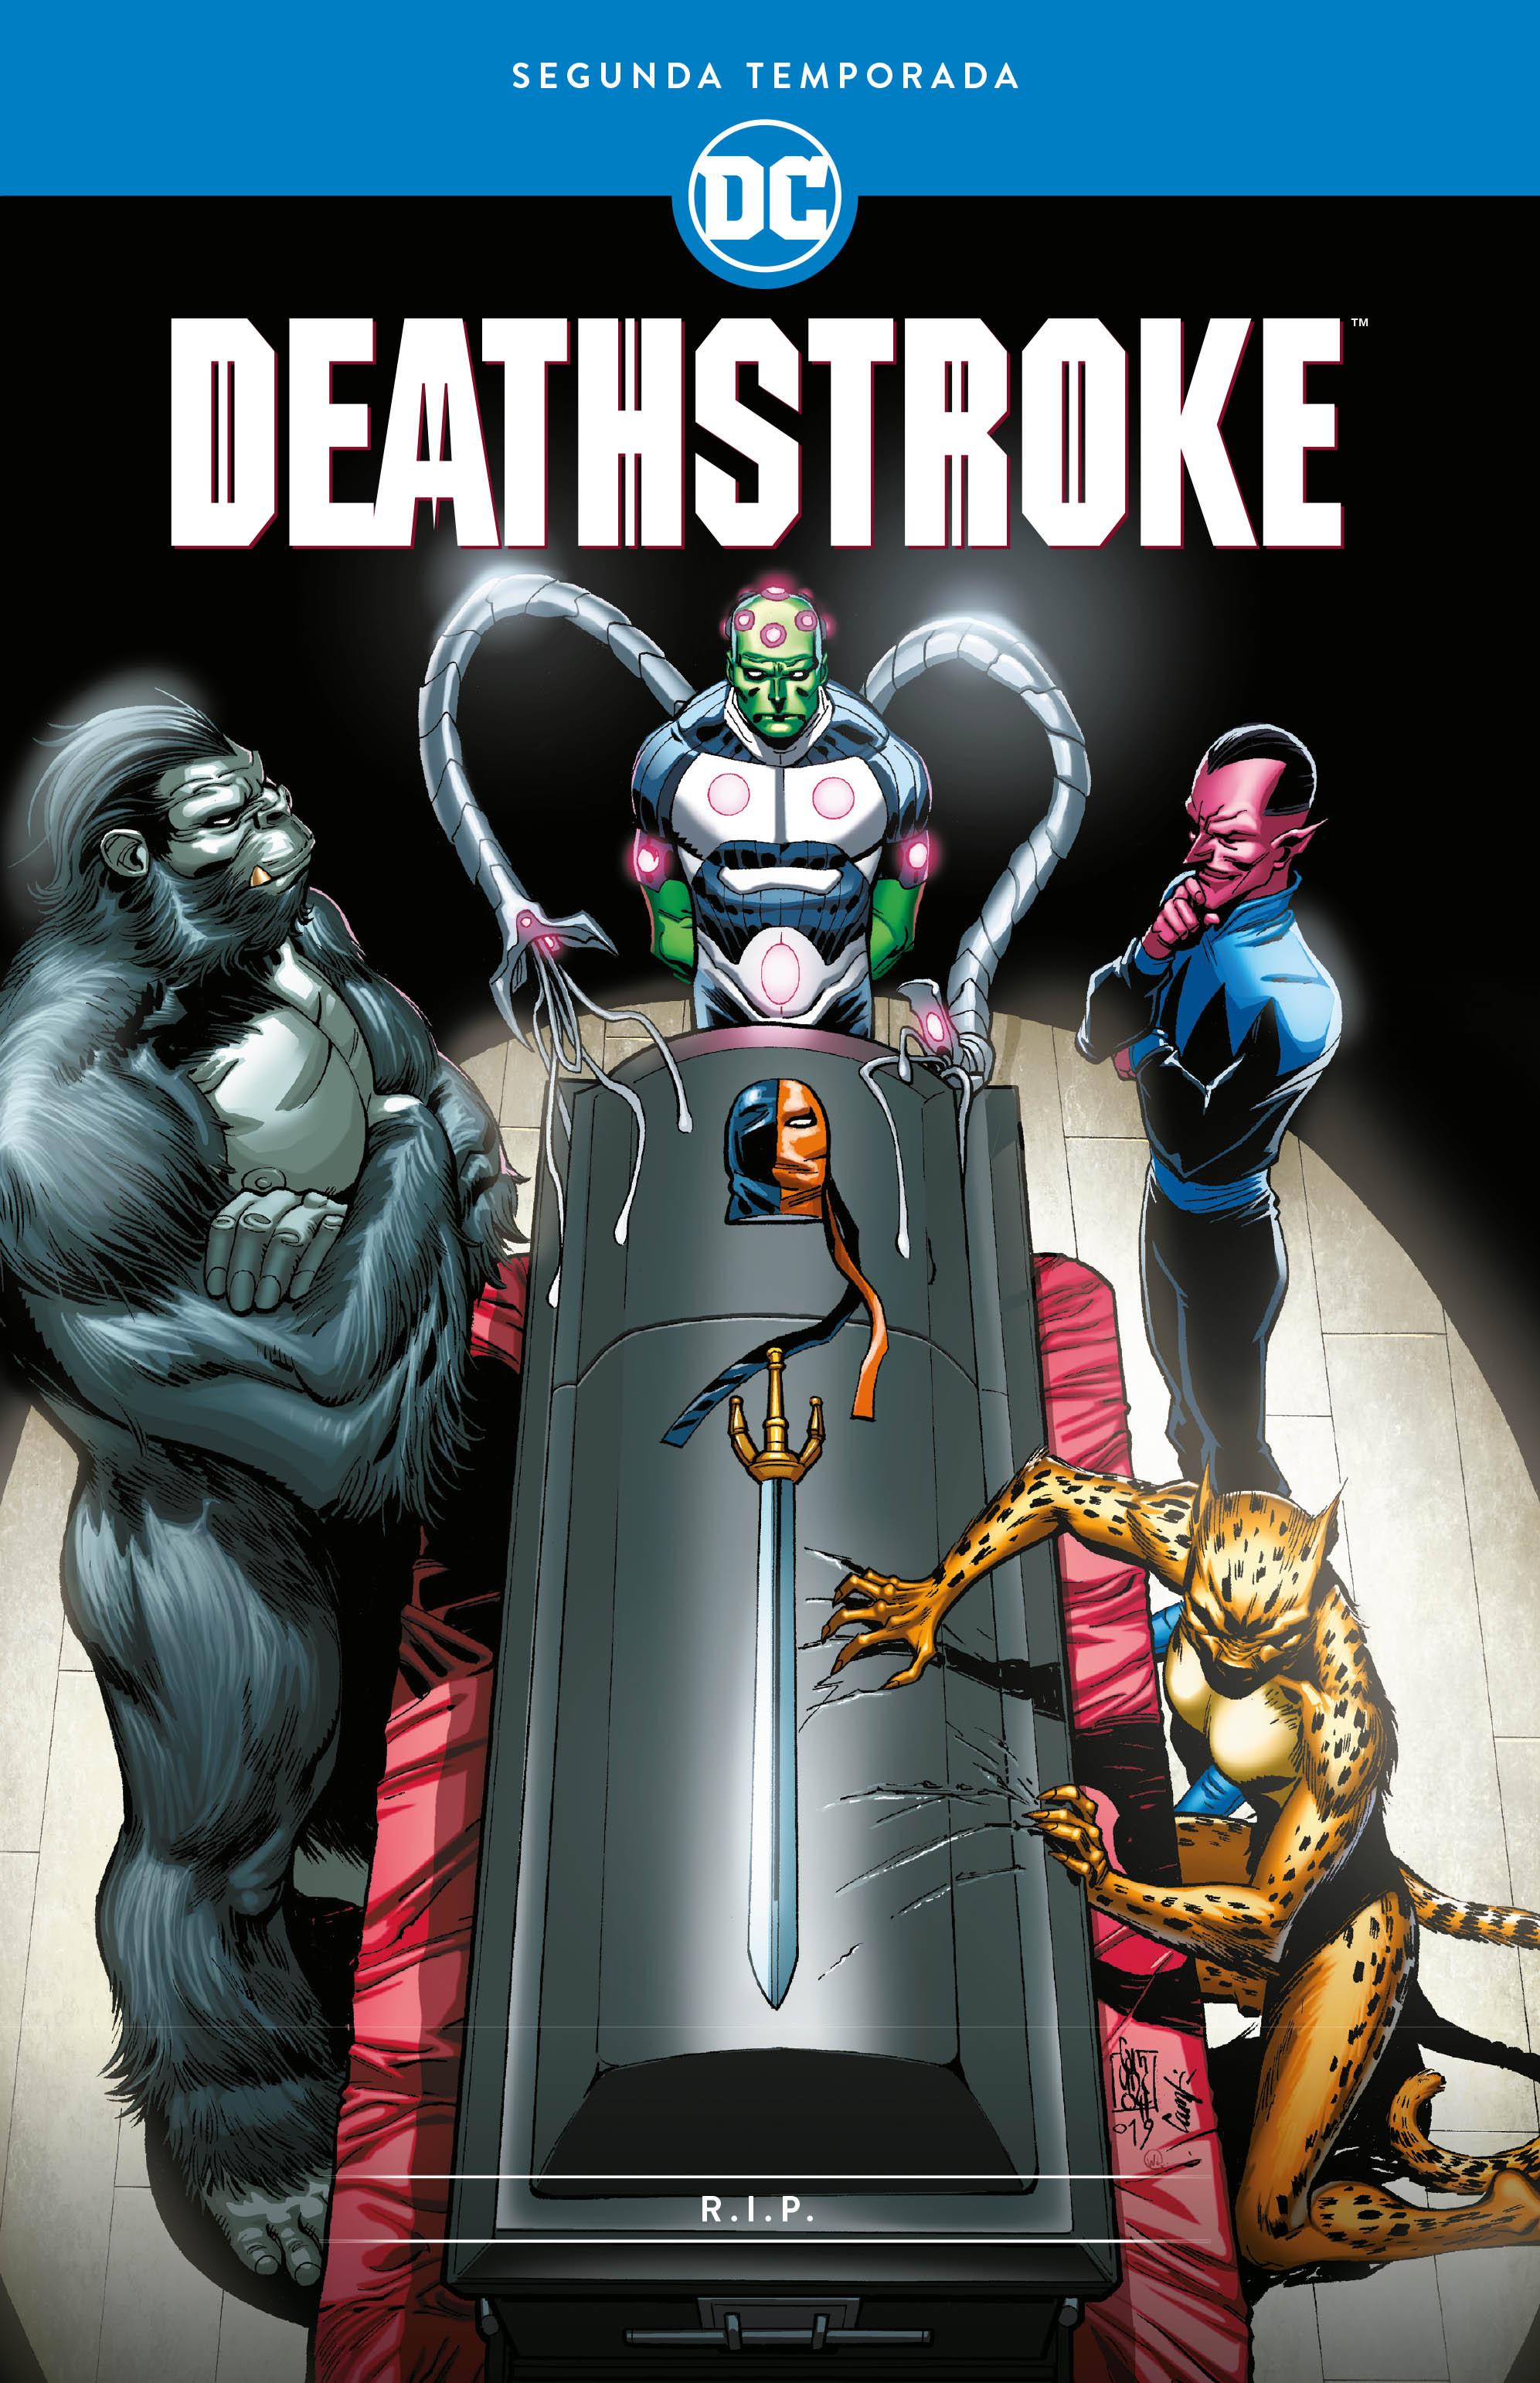 Deathstroke: Segunda temporada - R.I.P.